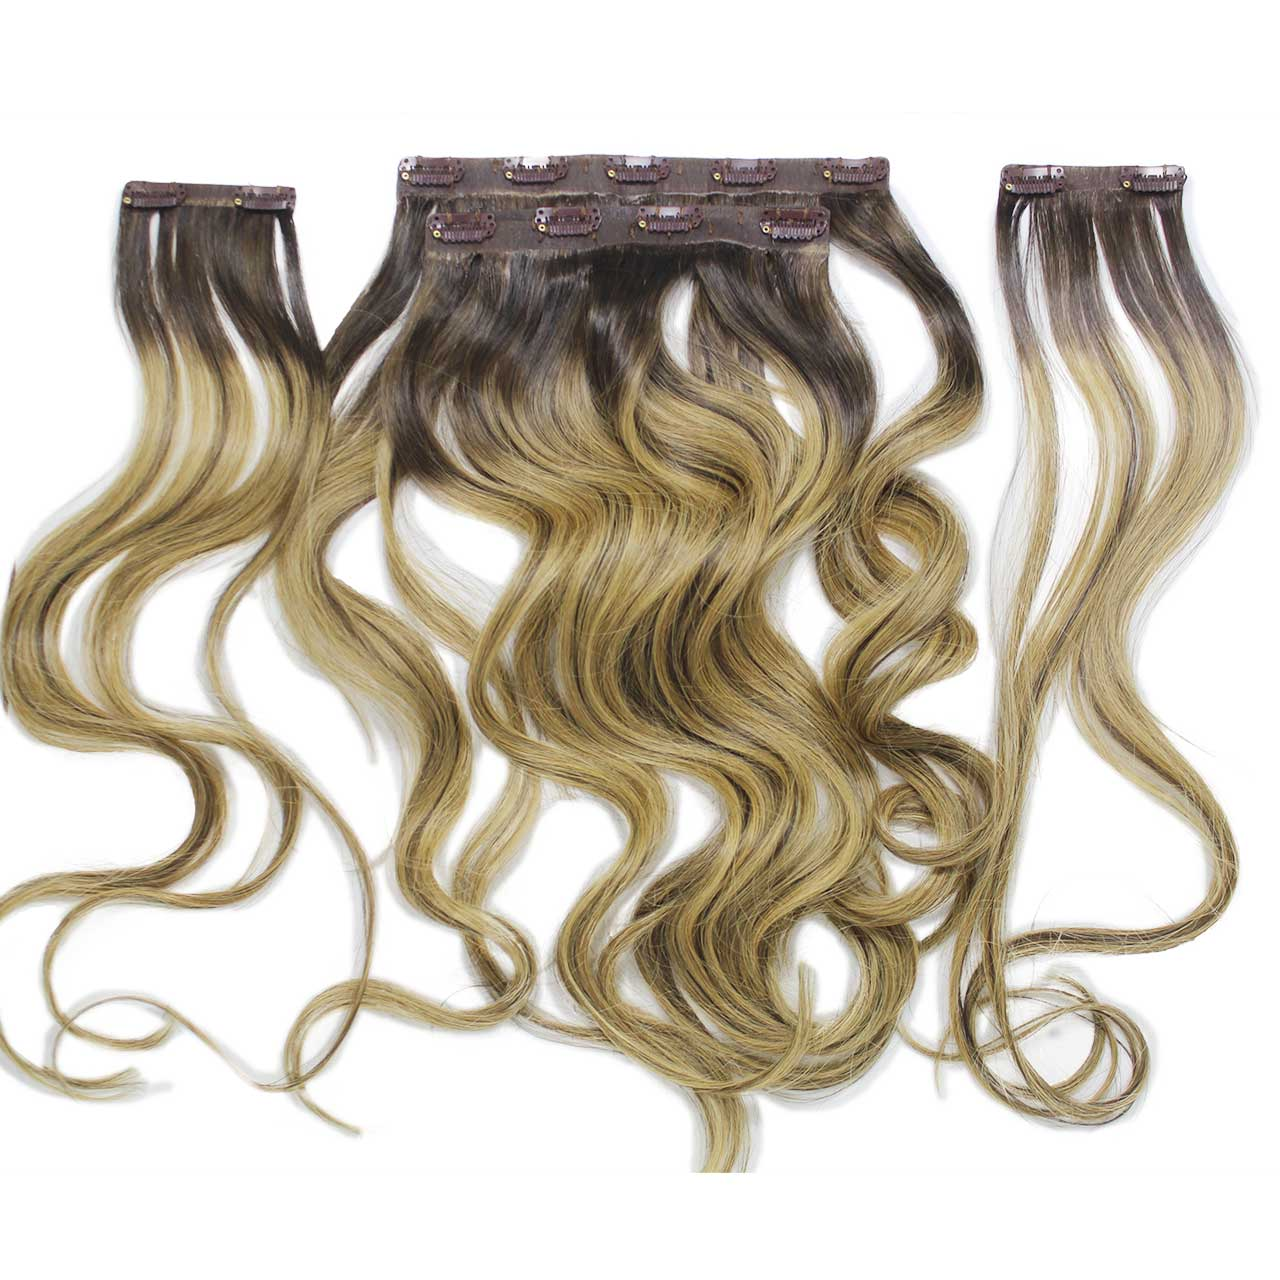 Aplique Tic Tac Ombré Hair 80g Cabelos Humanos Naturais Liso